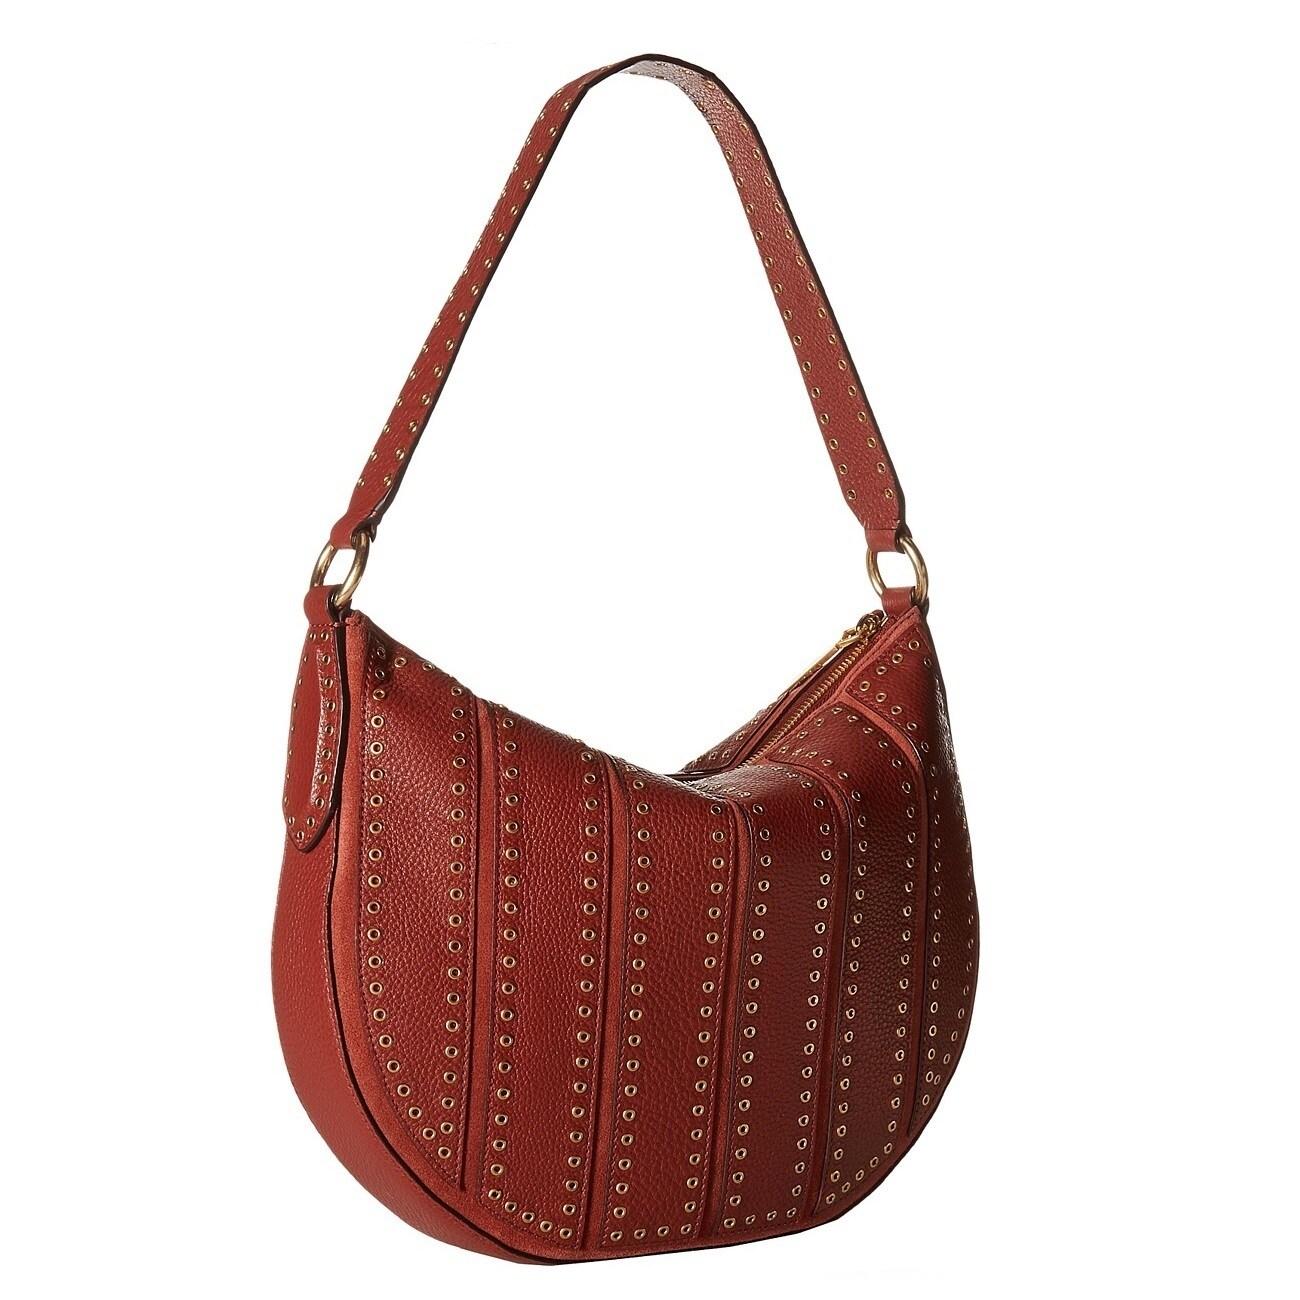 d7e0580fbdcb Shop Michael Kors Suede Medium Convertible Brick Hobo Handbag - On Sale - Free  Shipping Today - Overstock - 13477005